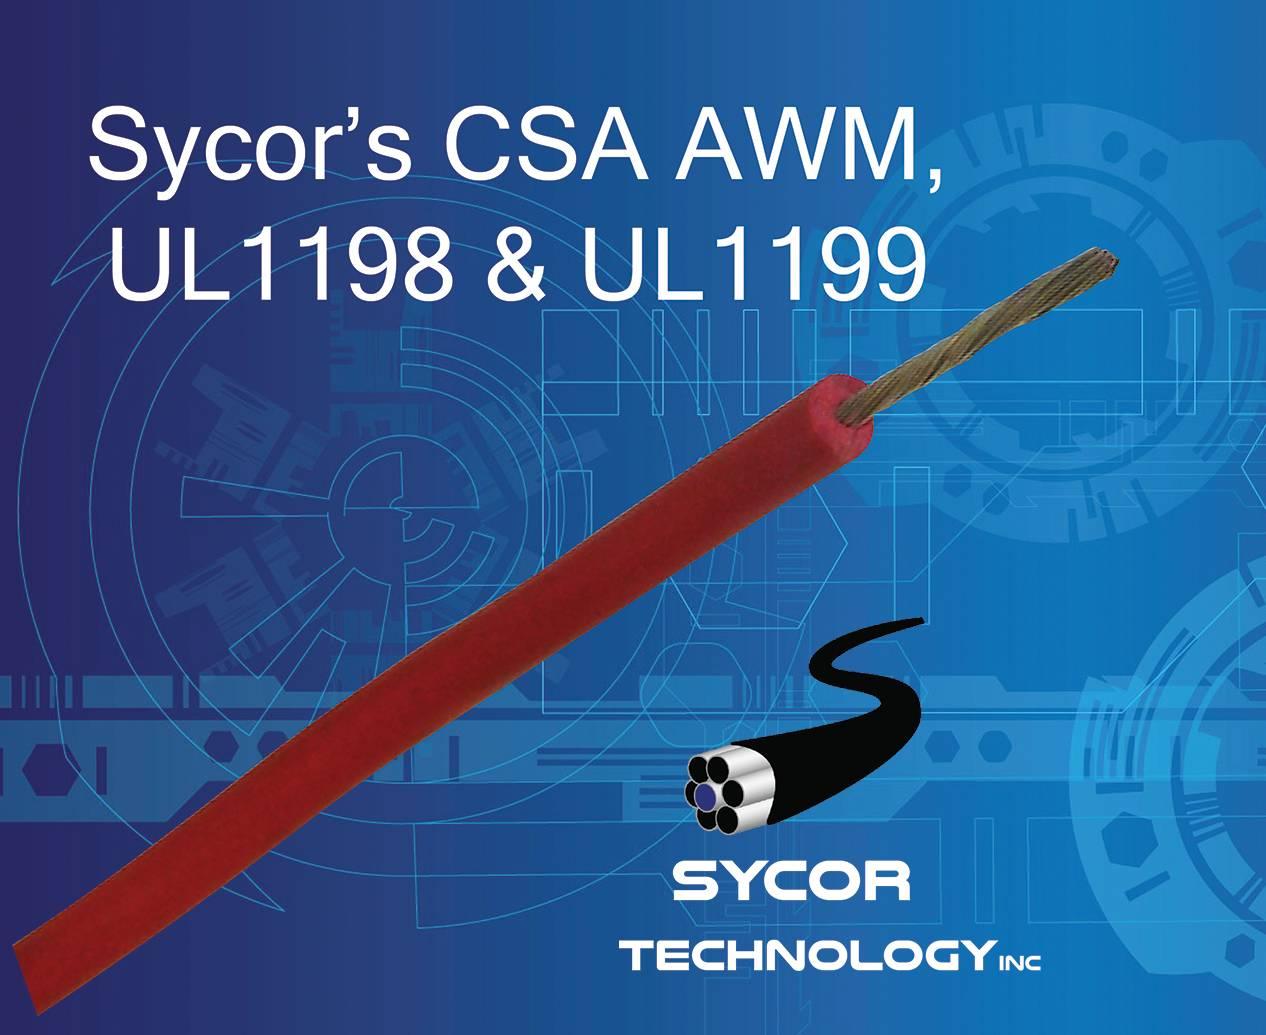 CSA AWM, UL1198, UL1199